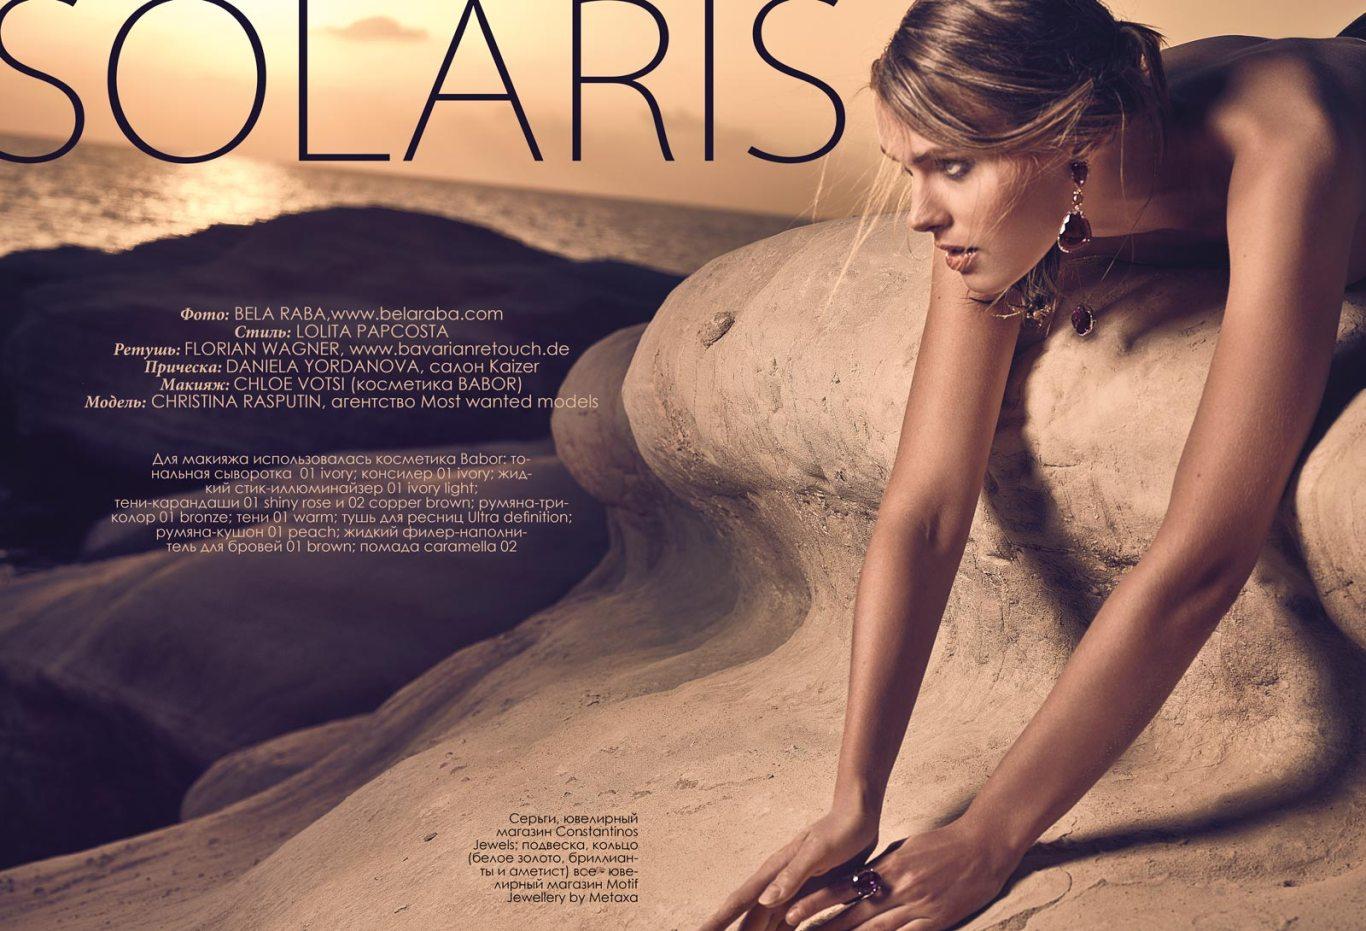 solaris-beauty-editorial-lr-image